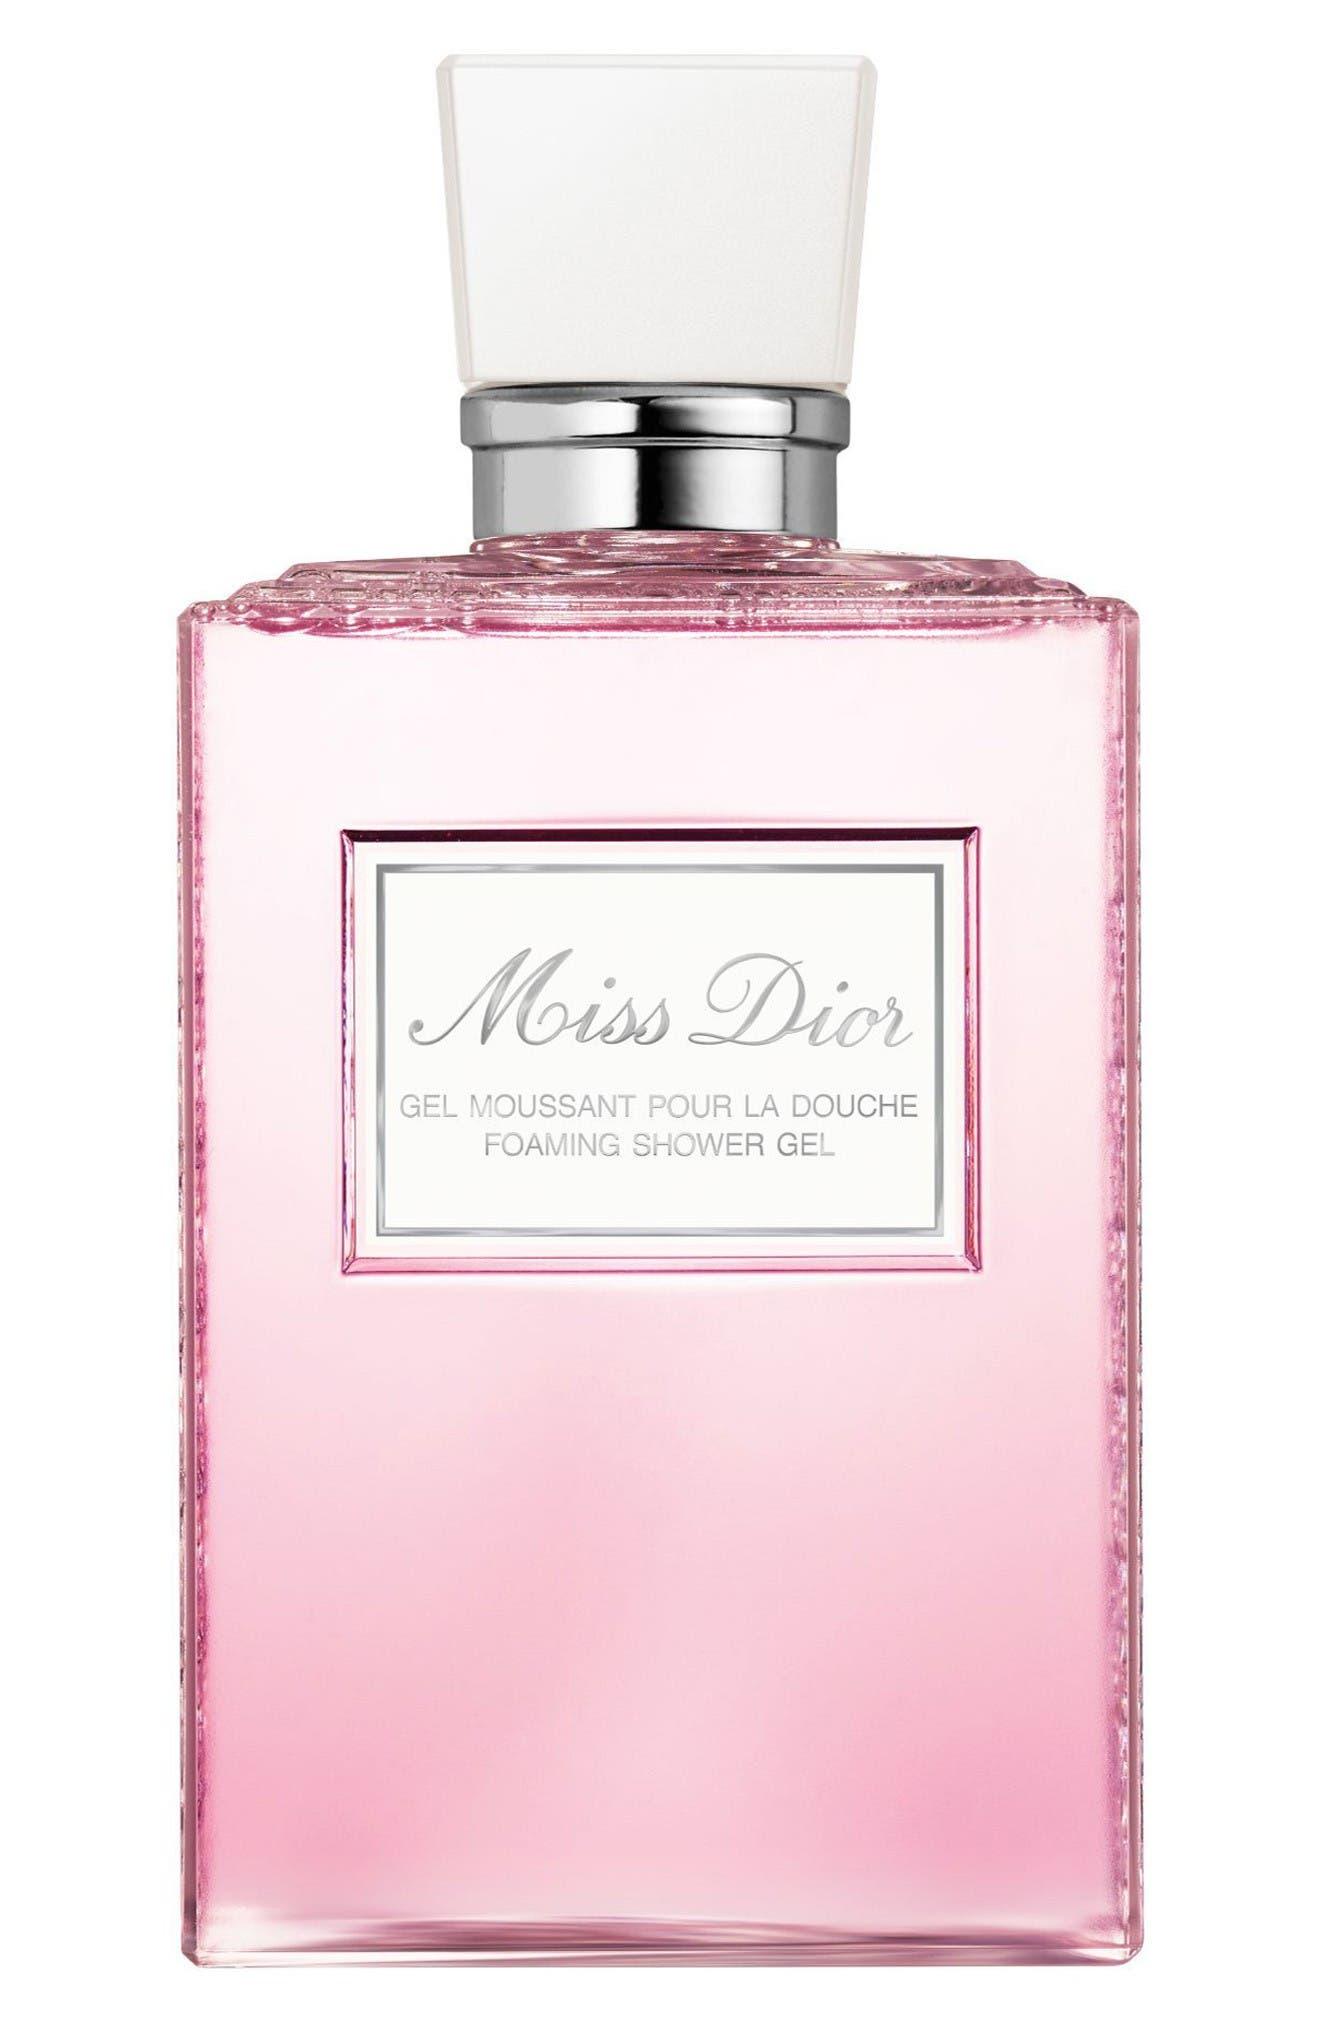 Dior Miss Dior Foaming Shower Gel